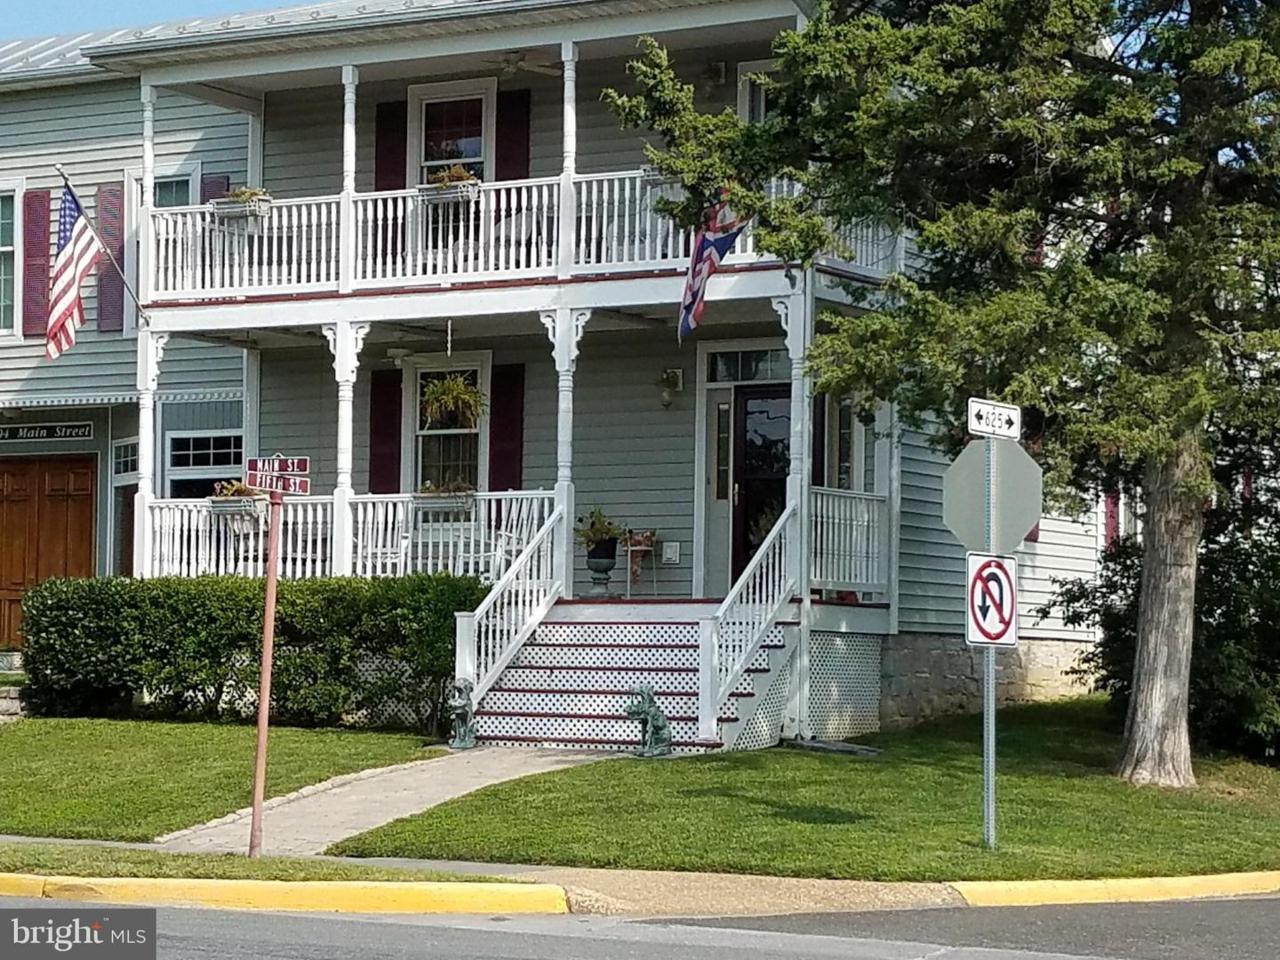 7994 Main Street - Photo 1